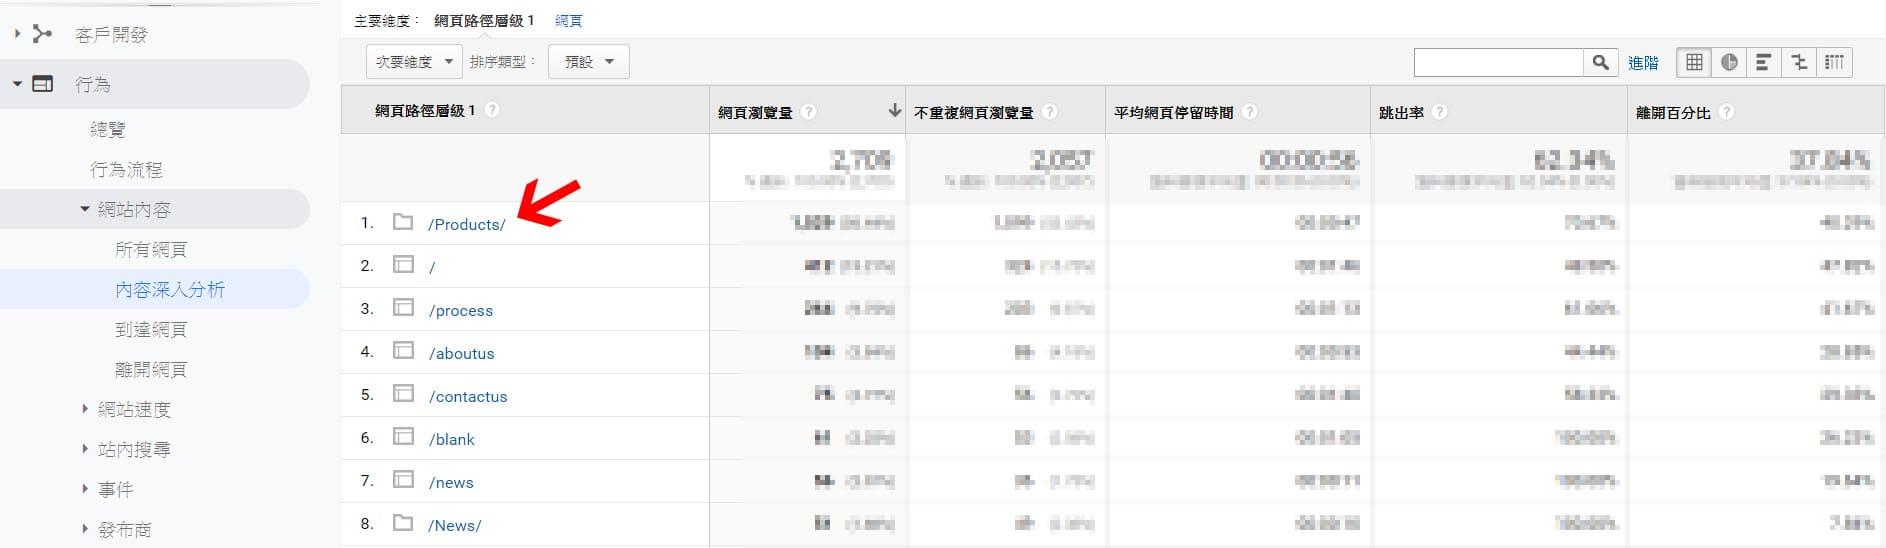 Google Analytics 內容深入分析